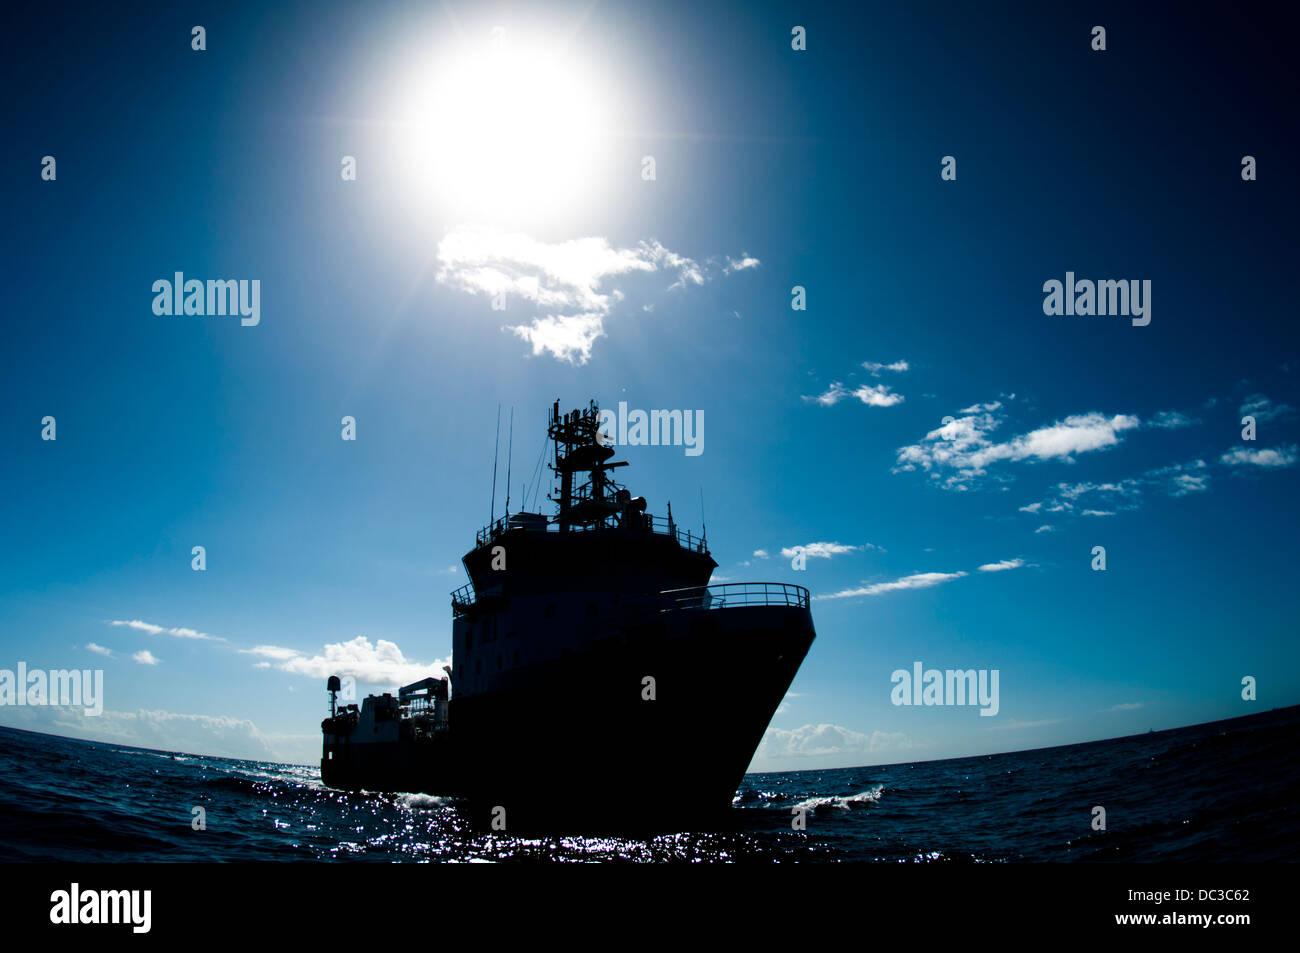 supply vessel silhouette back lite offshore hard sun - Stock Image